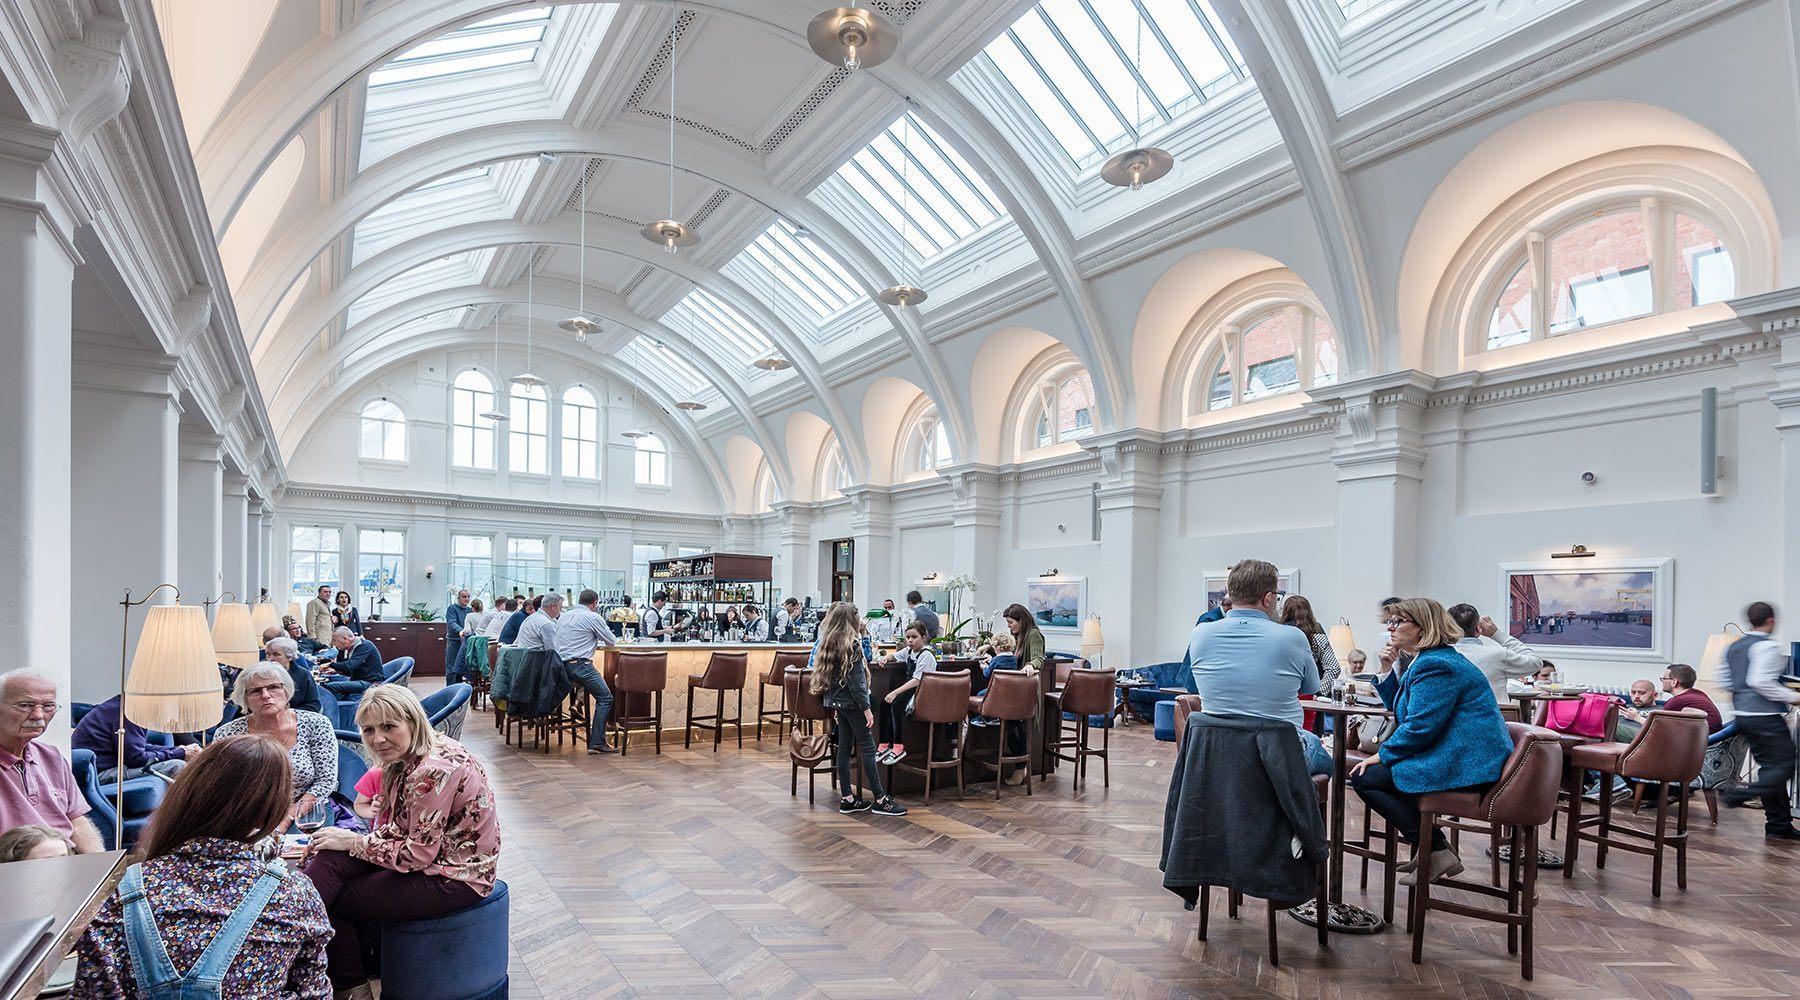 Titanic Hotel Belfast, RMI Architects Interior Projects